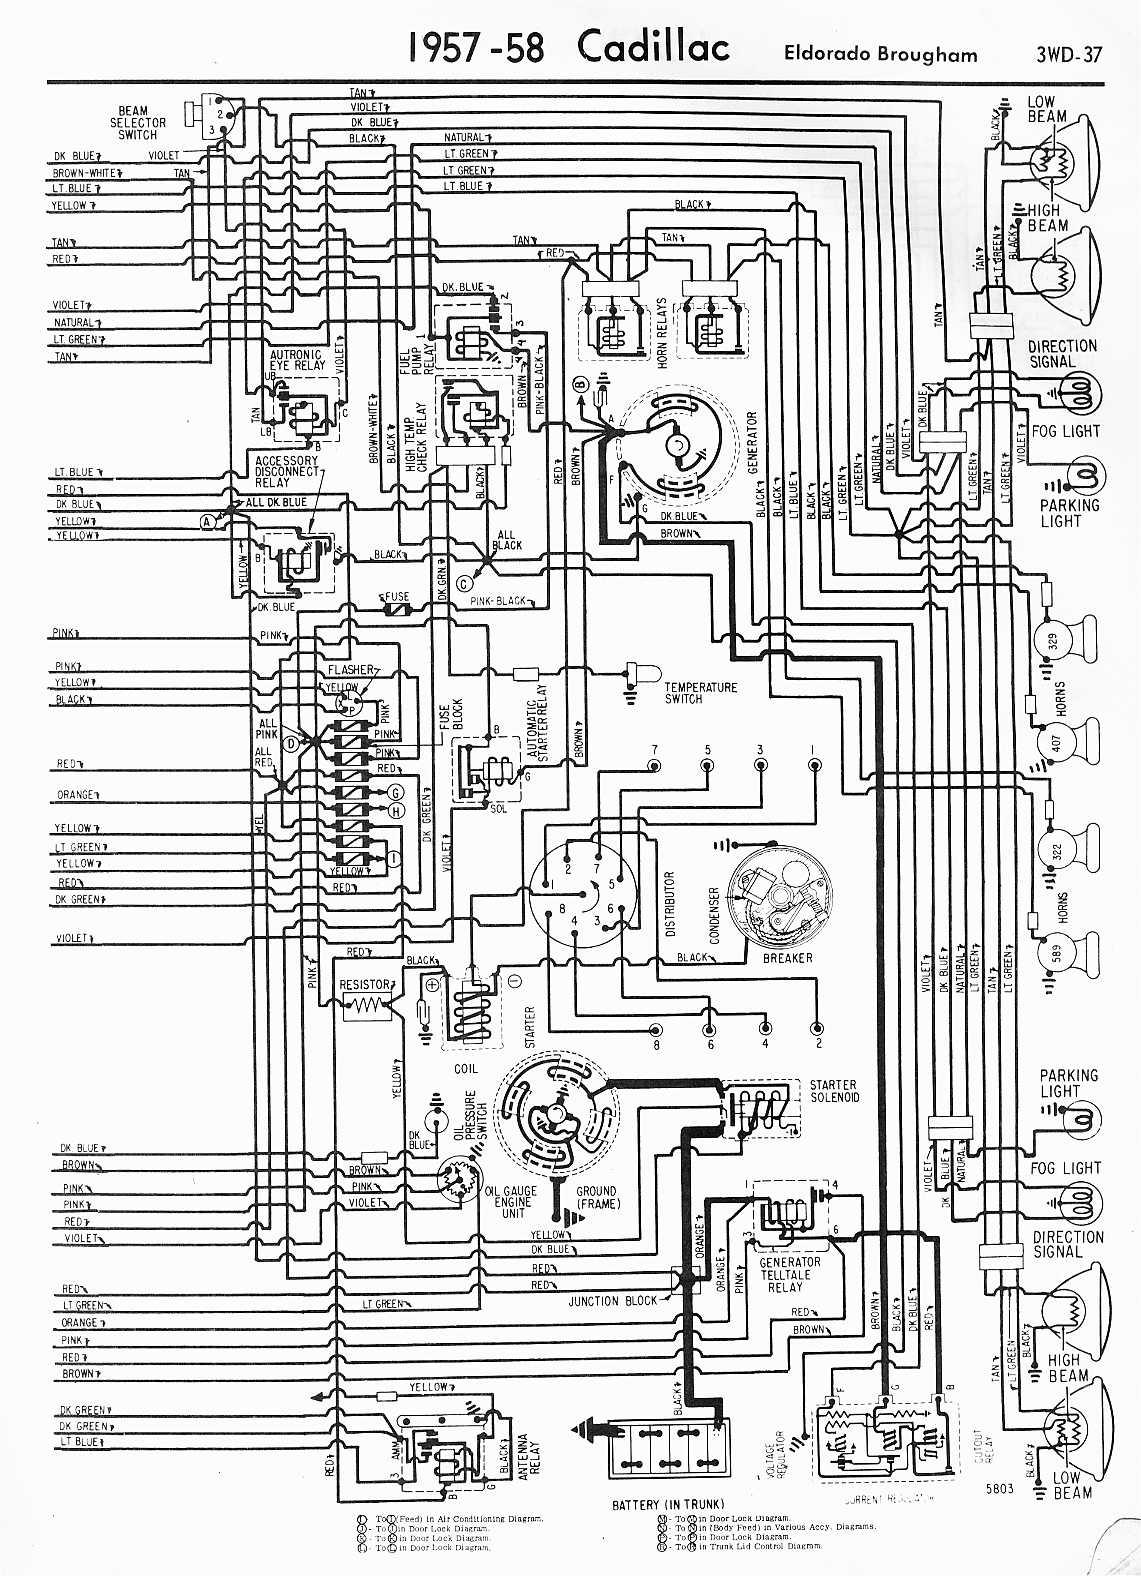 Surprising Wiring Diagram For 1992 Cadillac Fleetwood Wiring Diagram Tutorial Wiring Cloud Loplapiotaidewilluminateatxorg